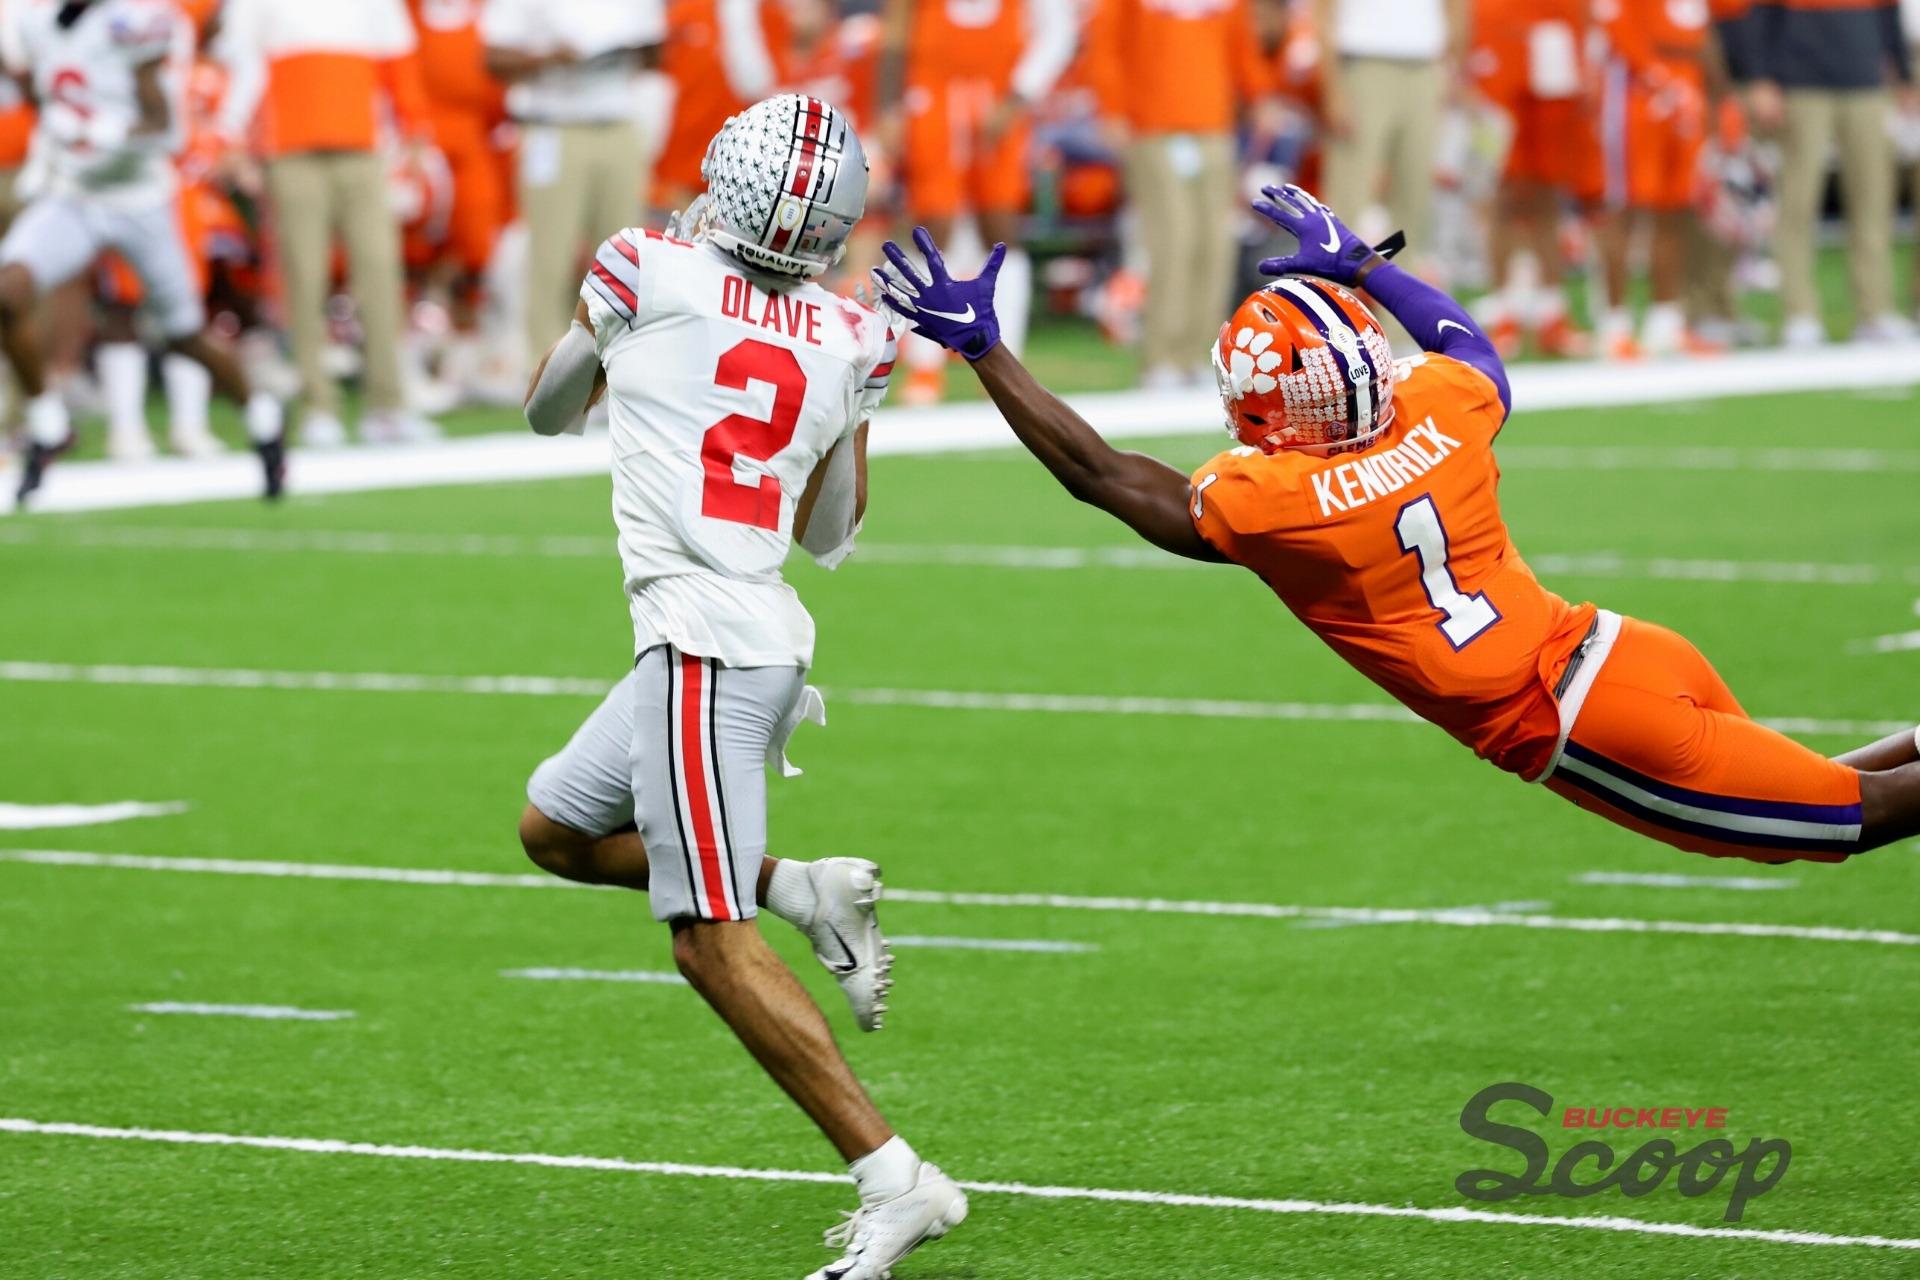 2021 Sugar Bowl Chris Olave touchdown Buckeyes Ohio State football